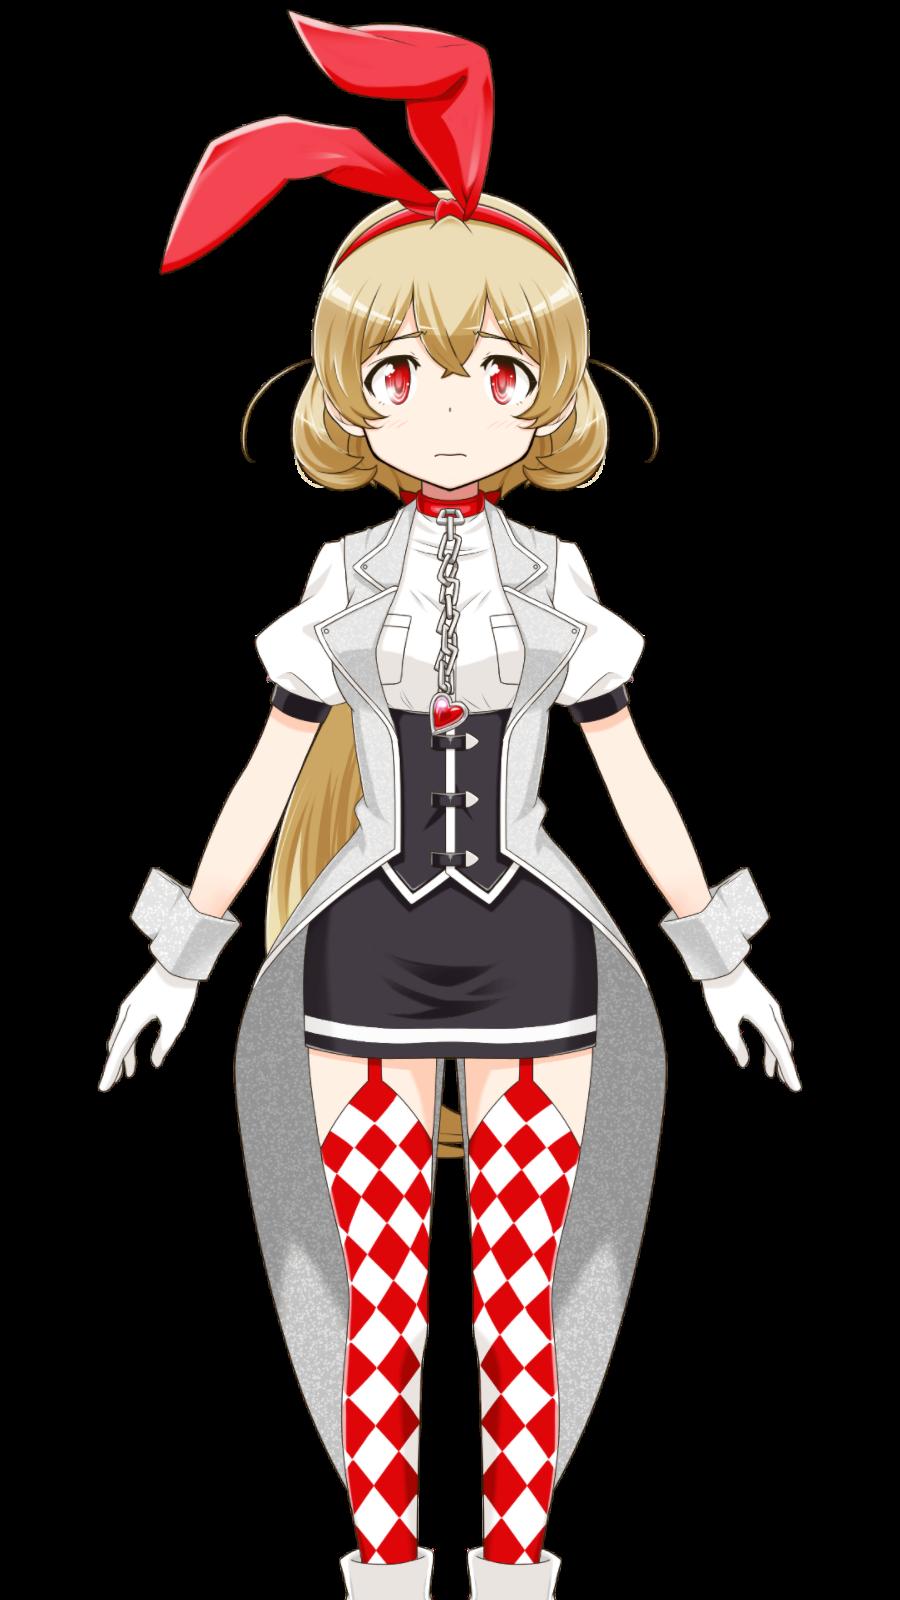 Nanase Yukika/Costumes